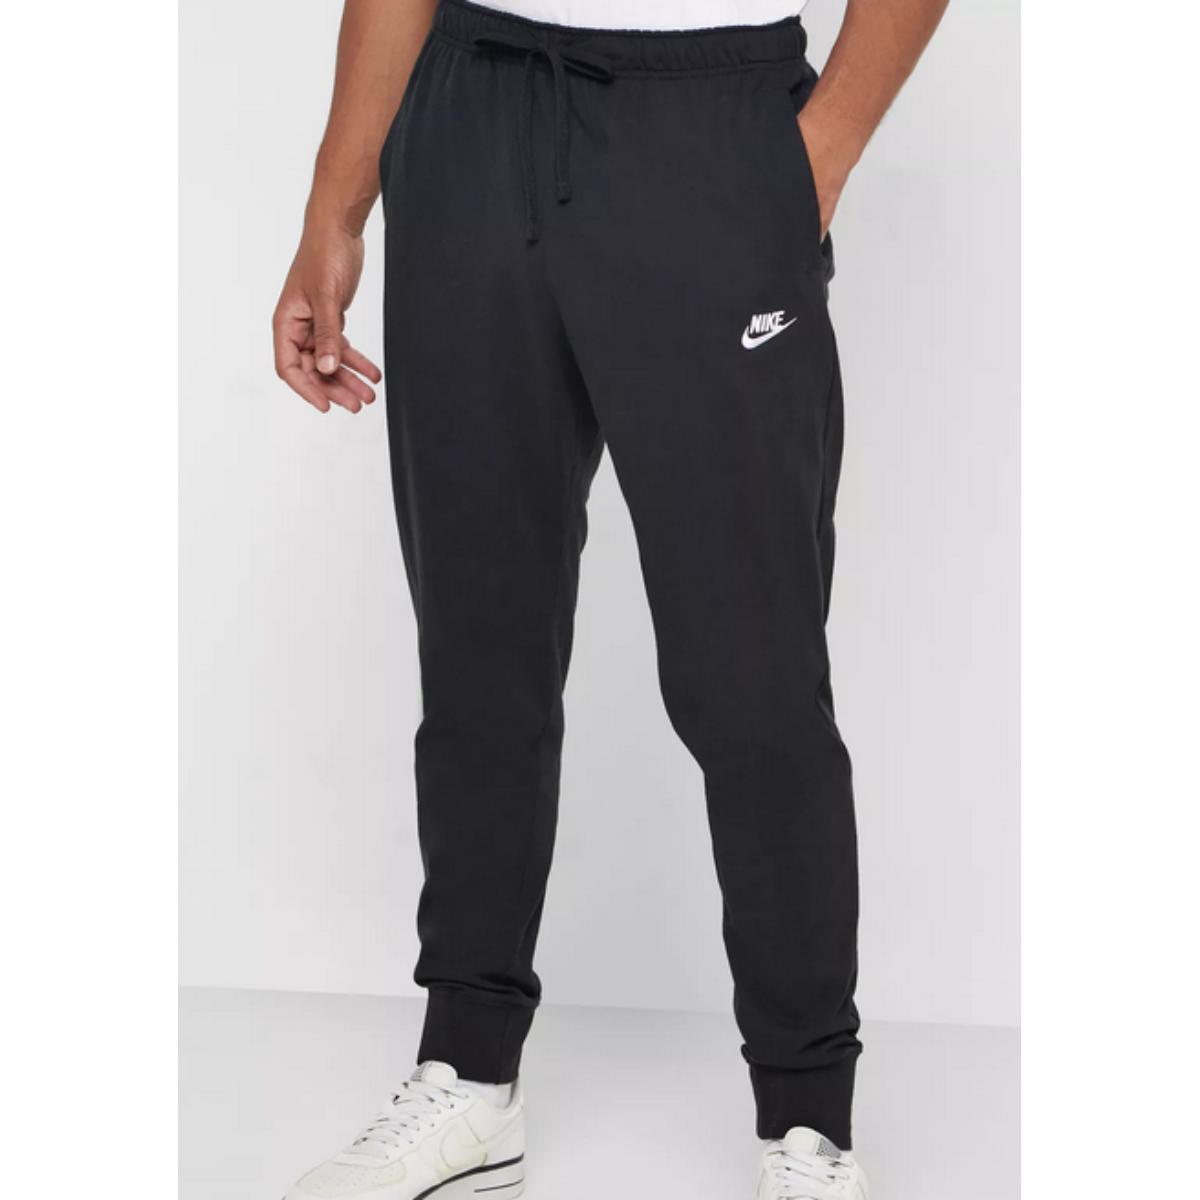 Calça Masculina Nike Bv2762-010 Nsw Club Jggr Preto/branco